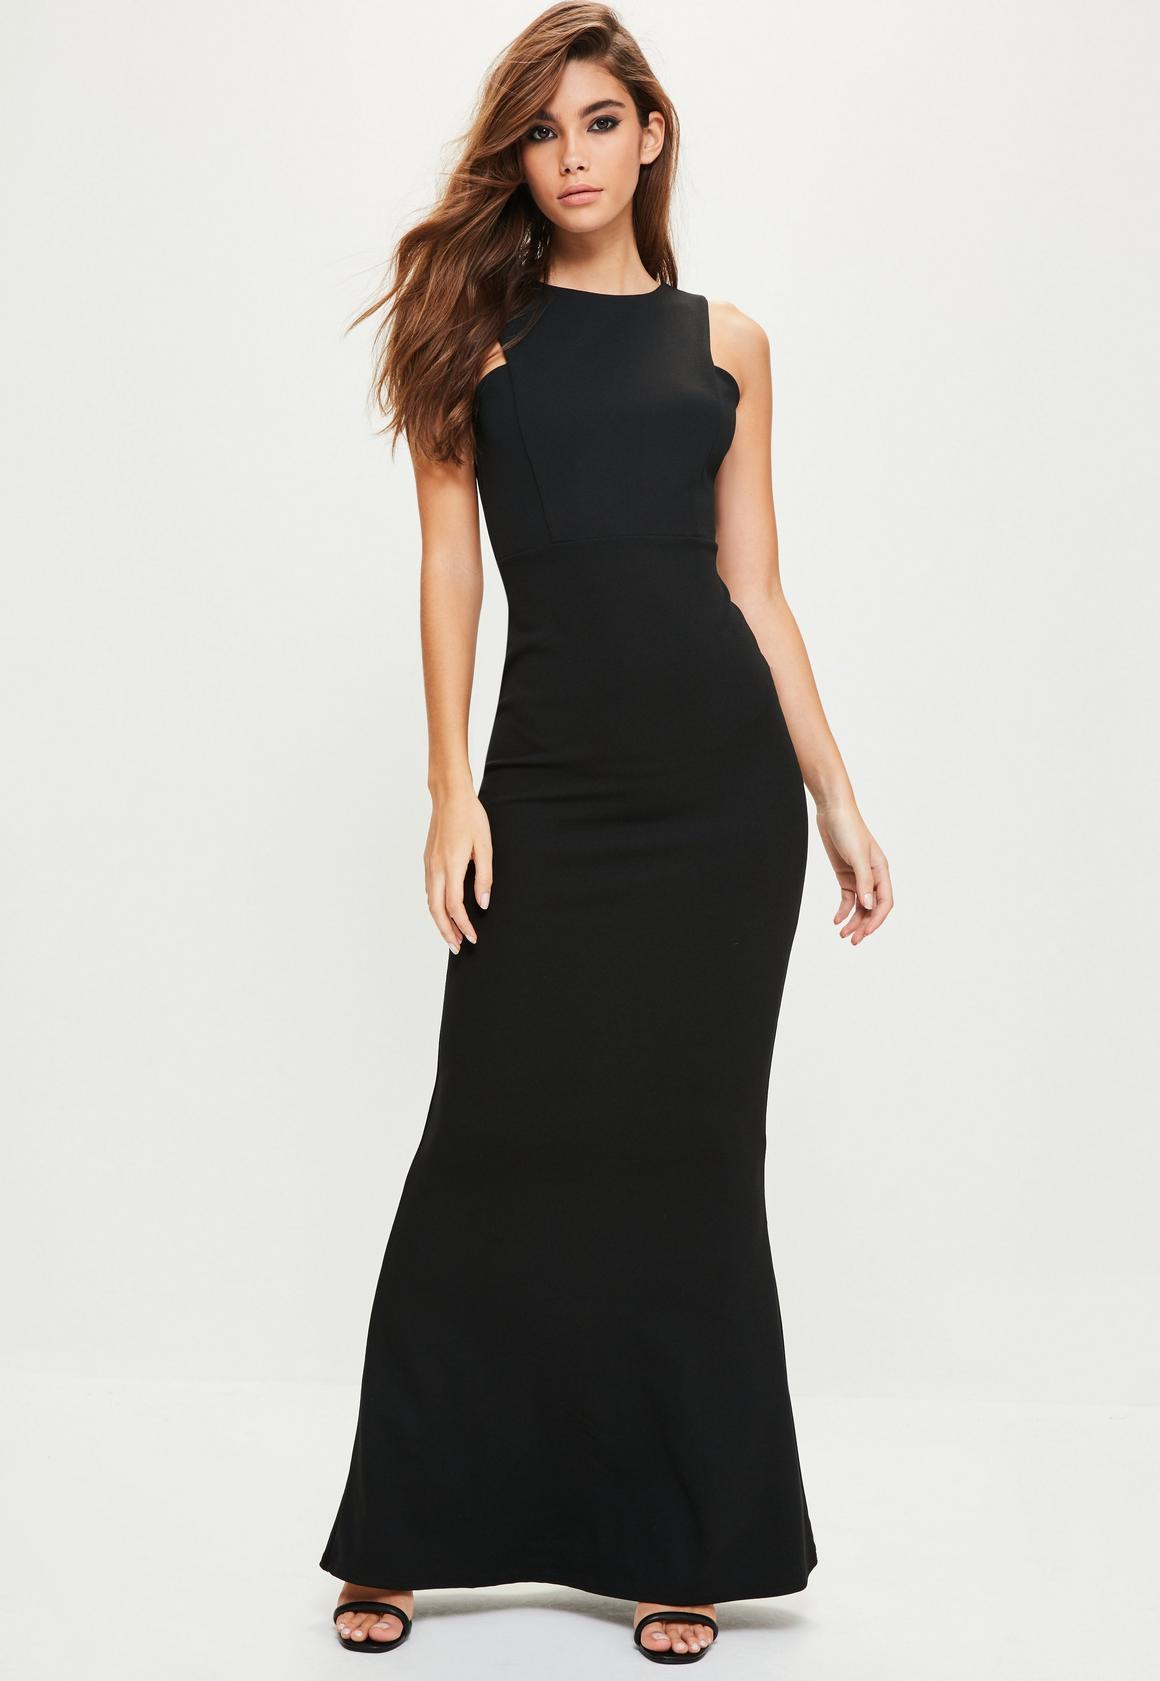 Black dress maxi - Black Low Back Maxi Dress Black Low Back Maxi Dress